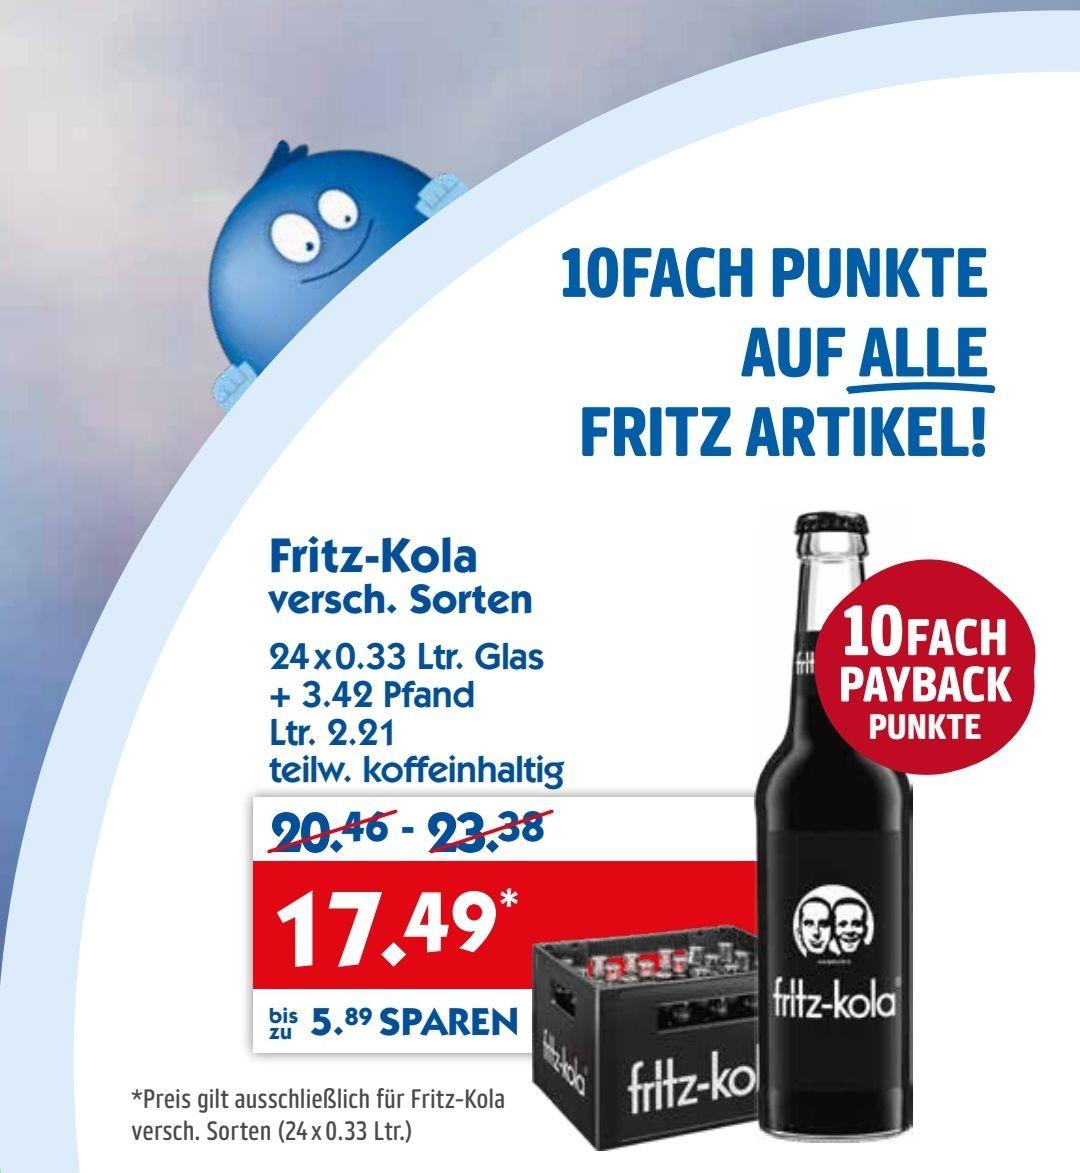 [HOLAB] Fritz Kola Kasten 24x 0,33l + 10fach Payback-Punkte